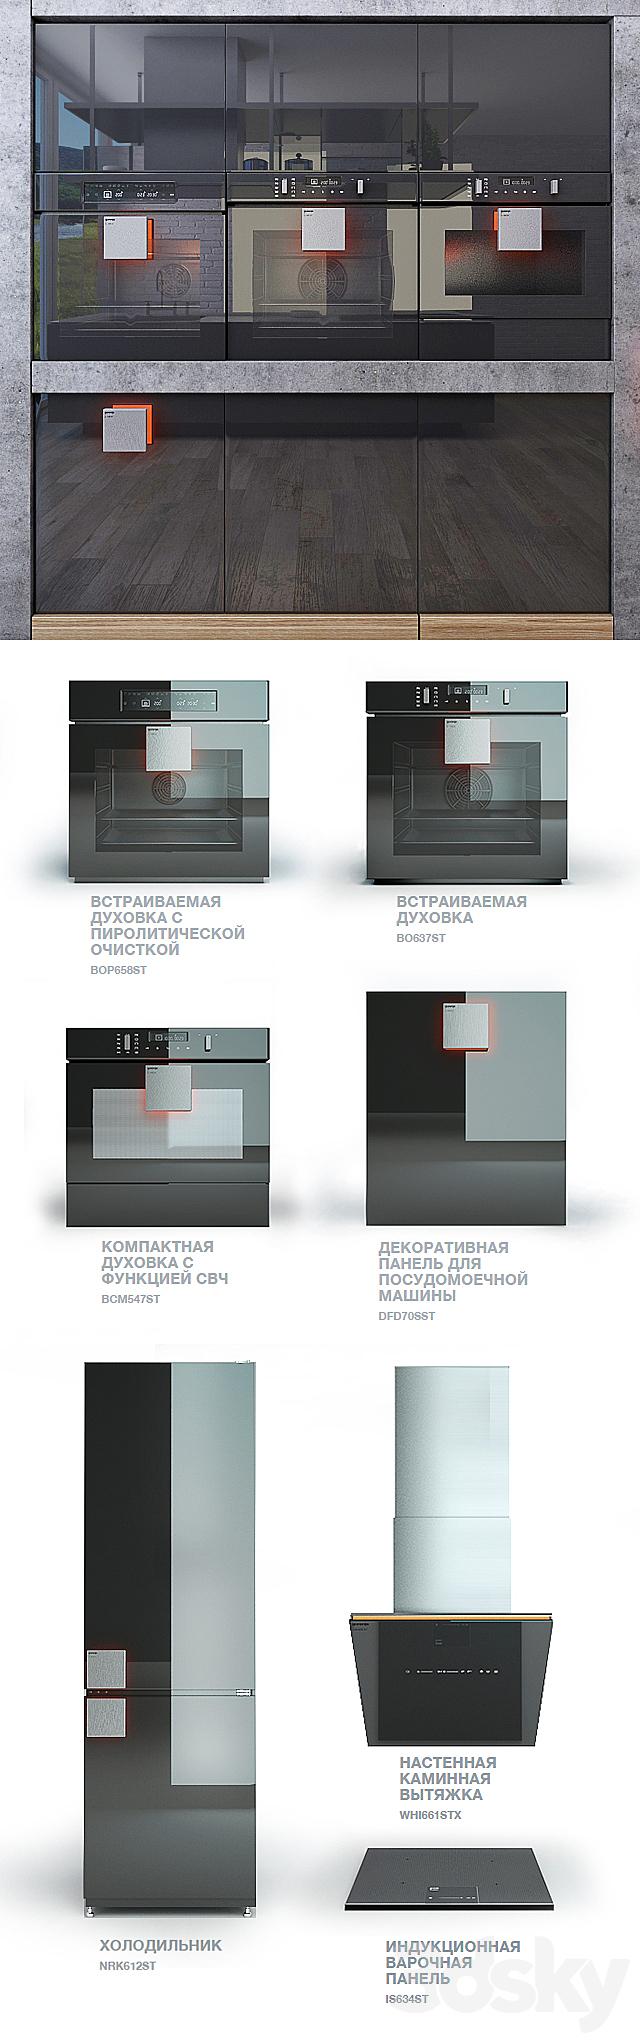 Gorenje - line design by Philippe Starck